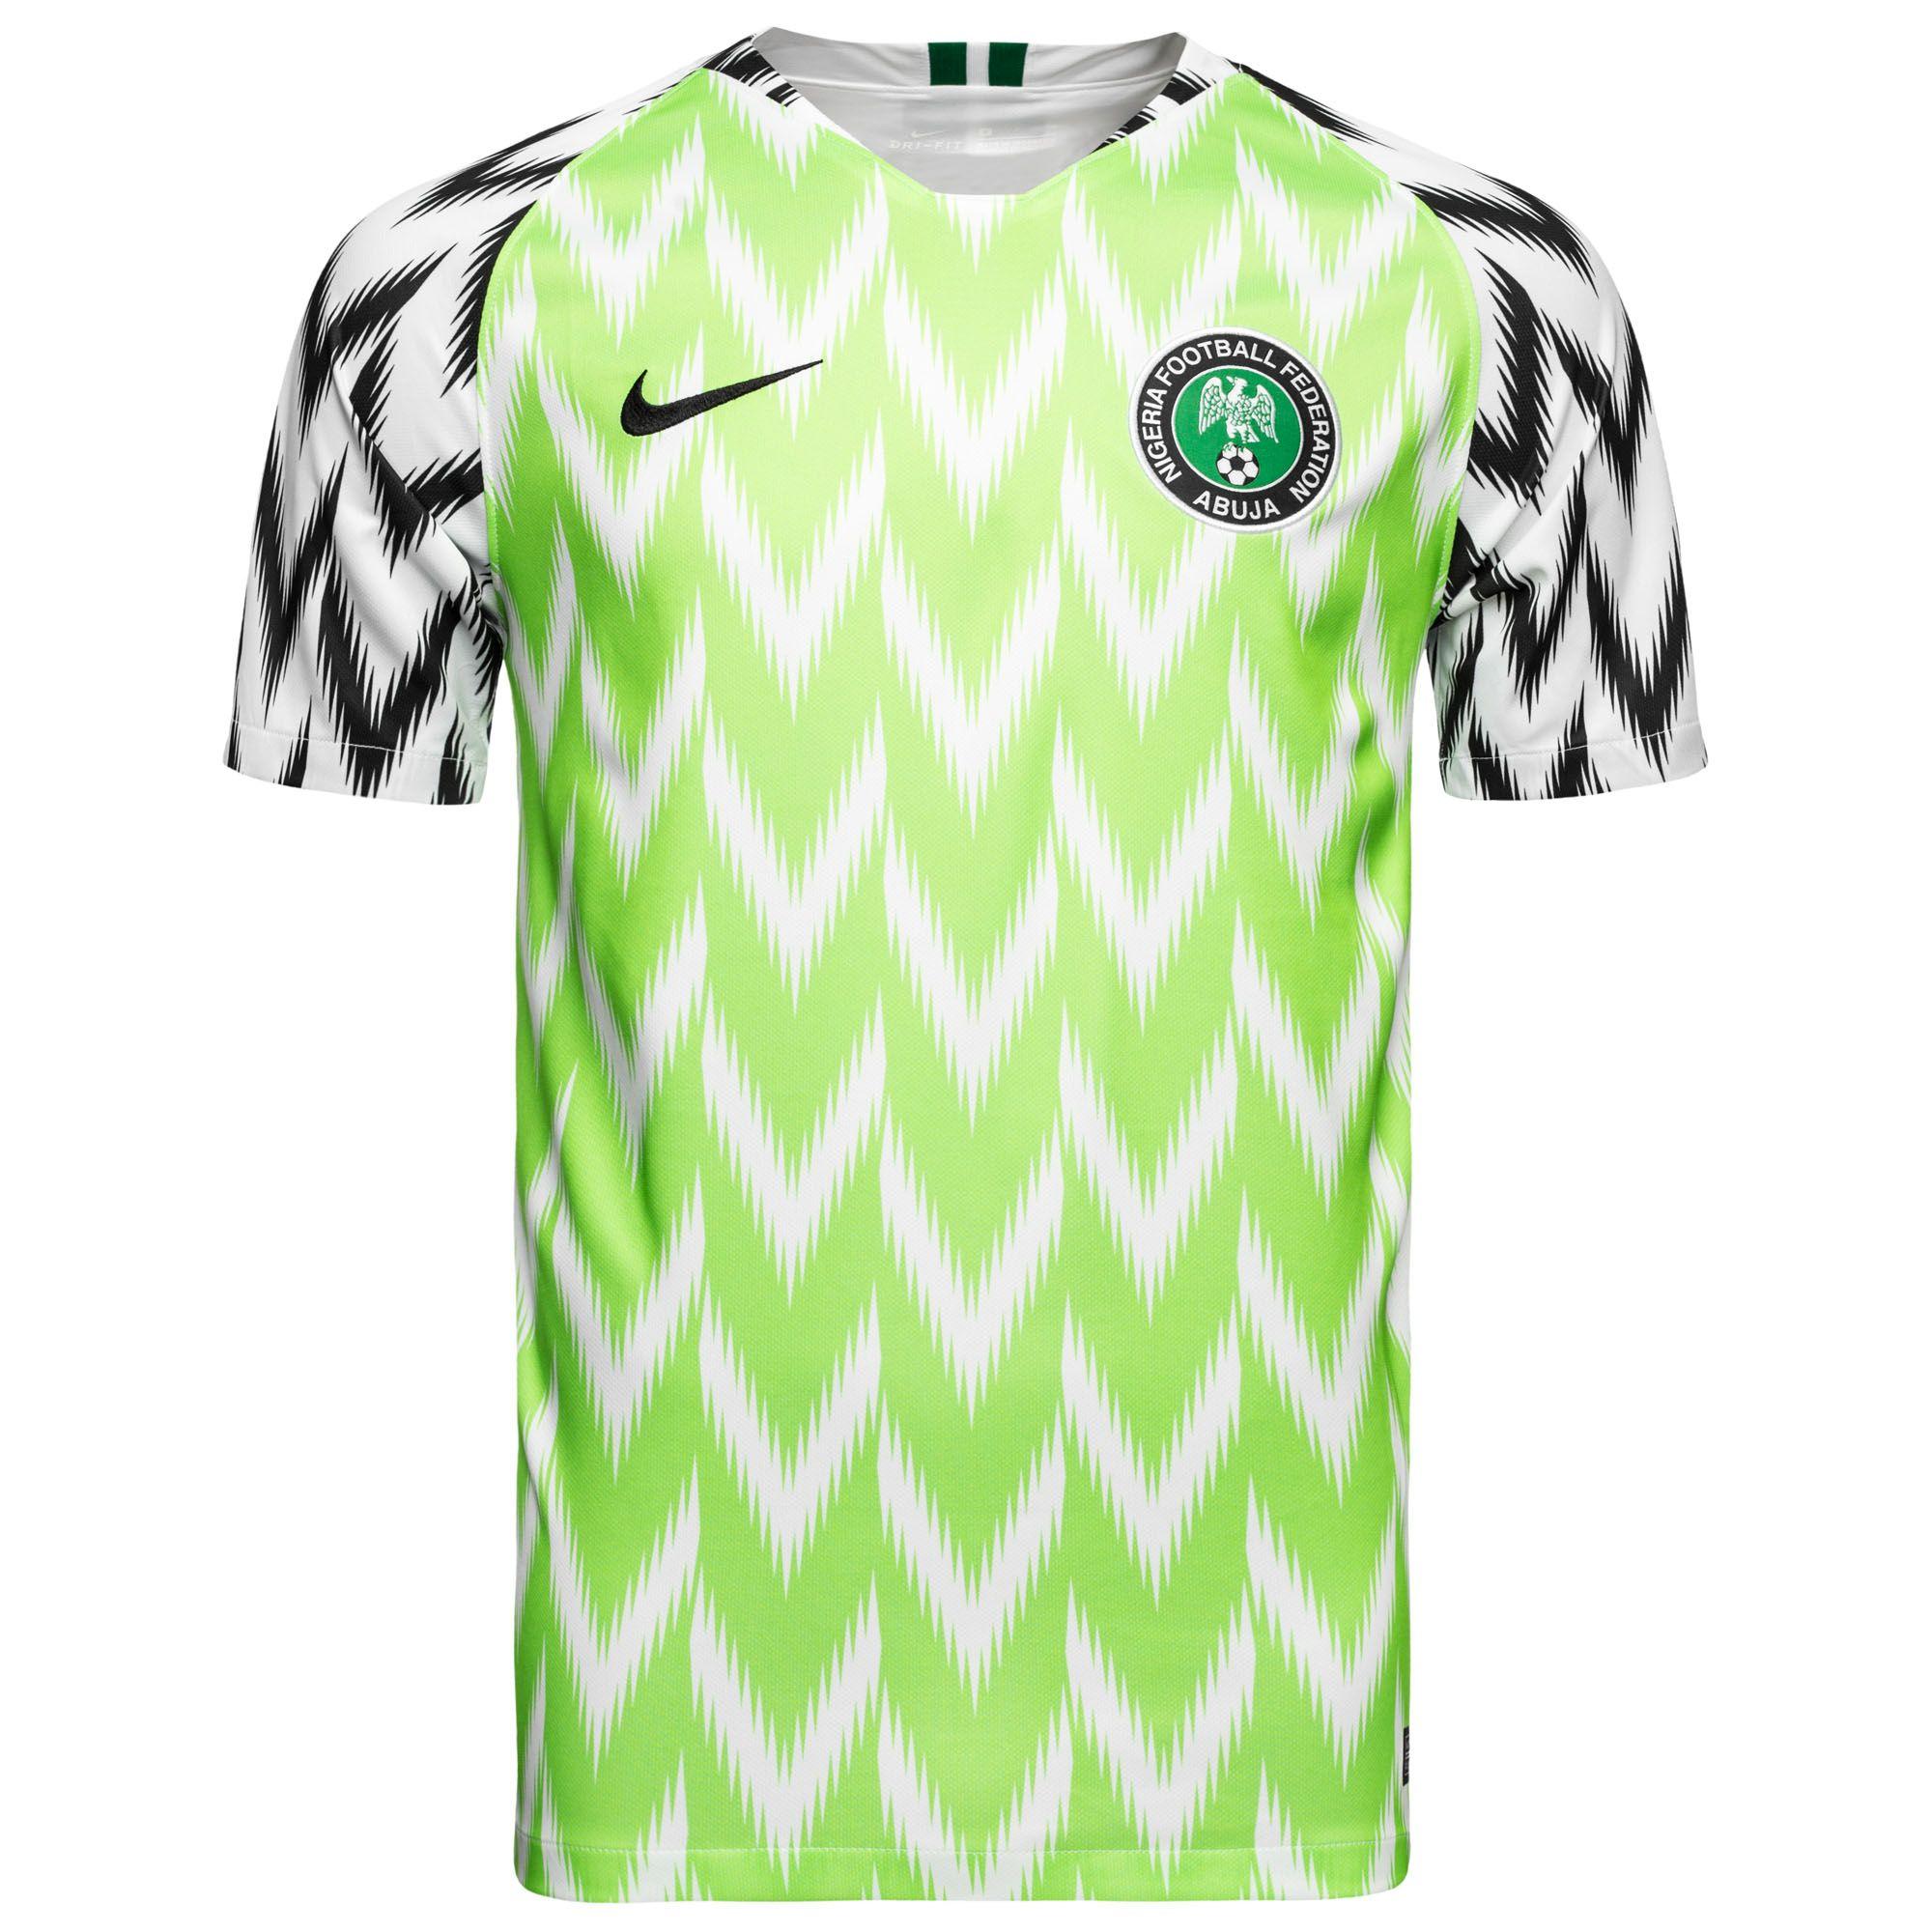 Unisport Nigeria-Home